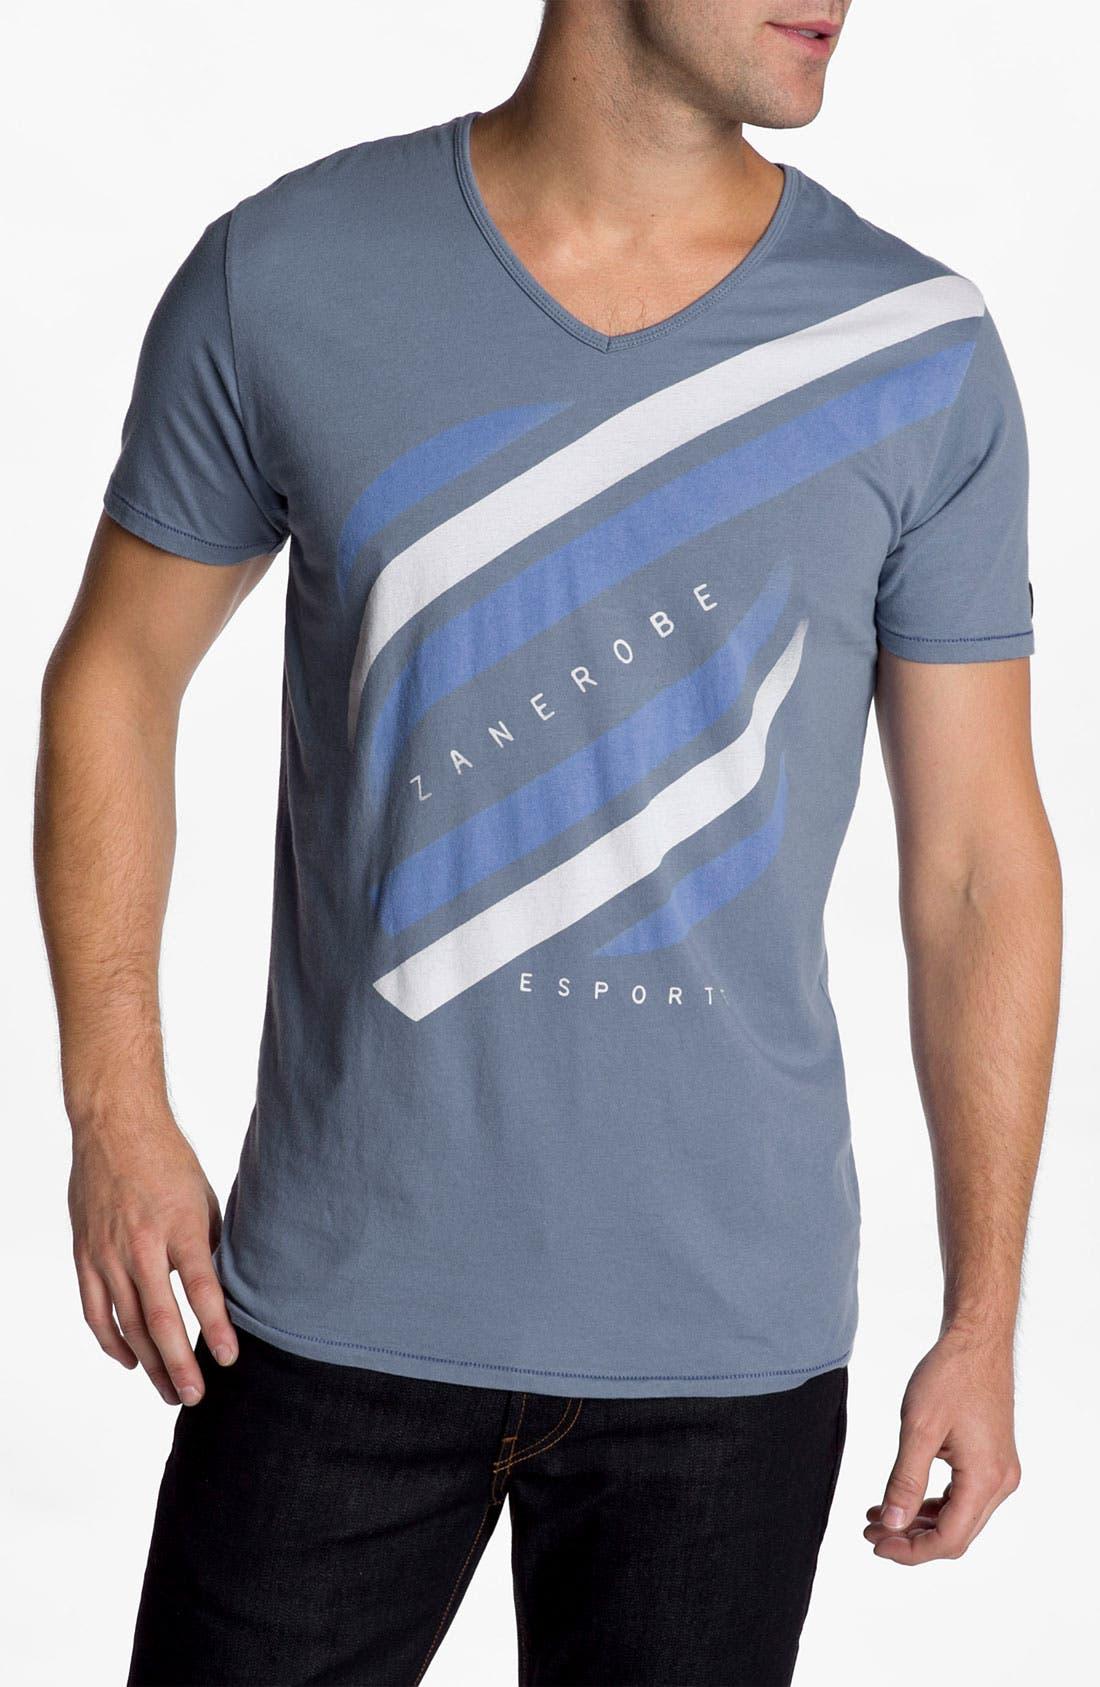 Main Image - Zanerobe 'Esporte' T-Shirt